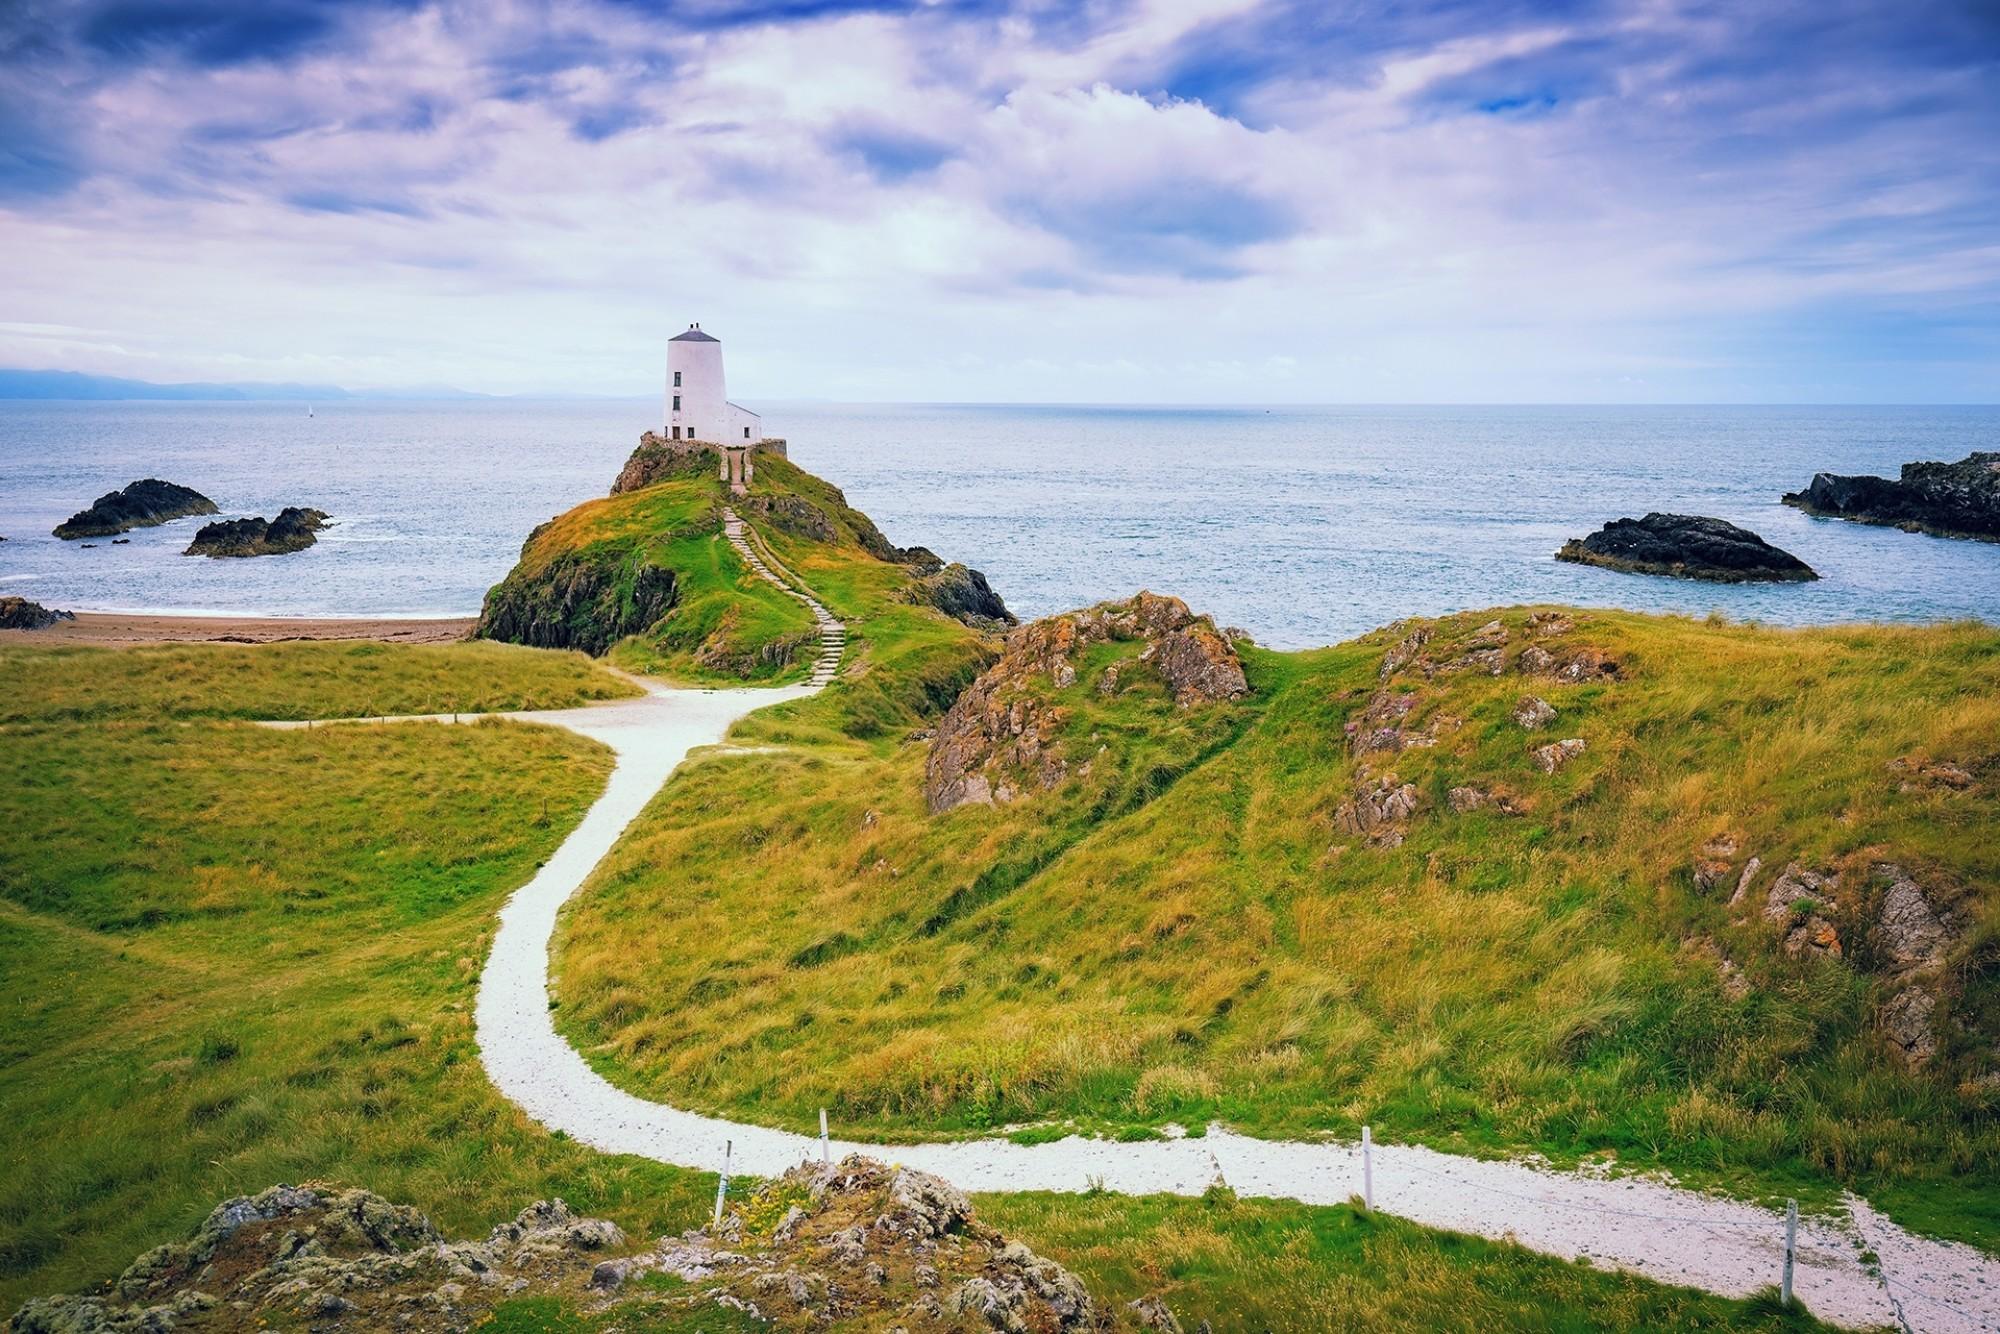 Llanddwyn-Island-on-the-coast-of-Anglesey-in-north-Wale Uk